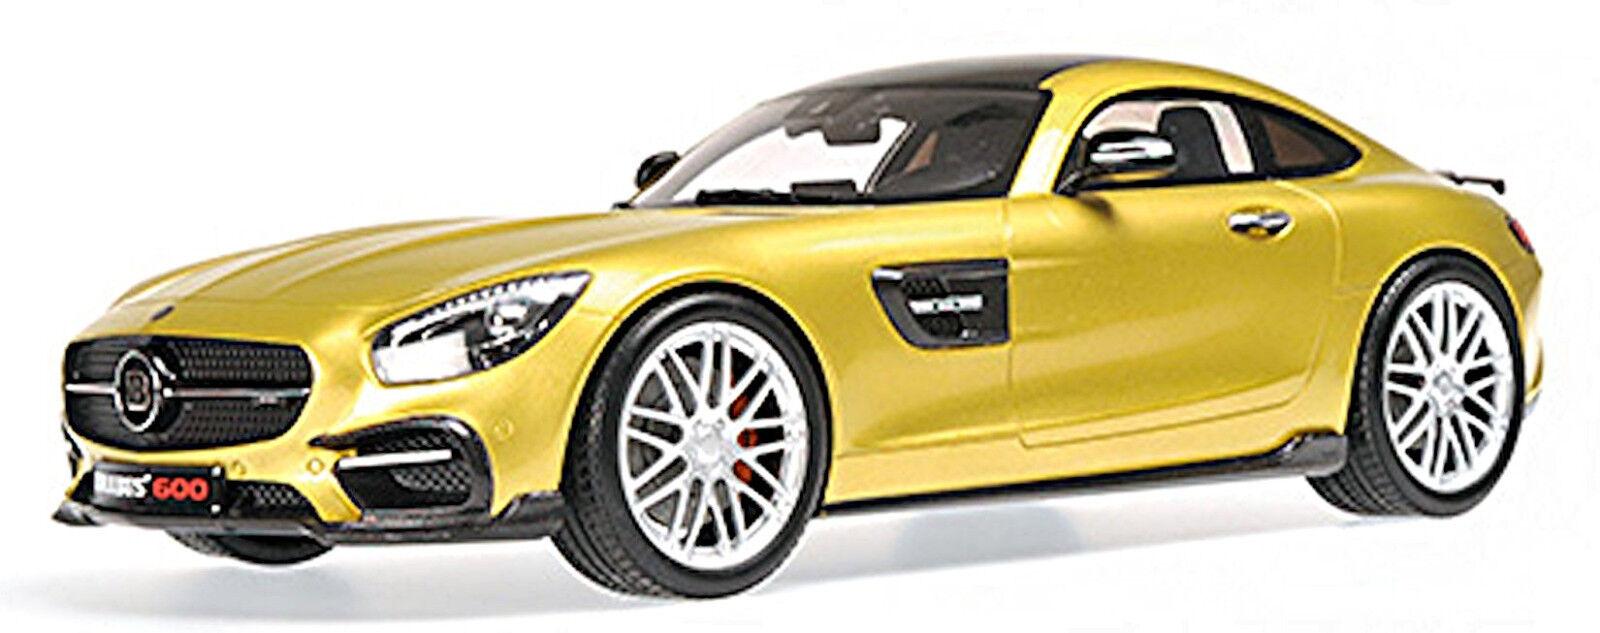 BRABUS 600 Coupe 2015 sur base Mercedes AMG GT S or Metallic 1 18 Minichamps